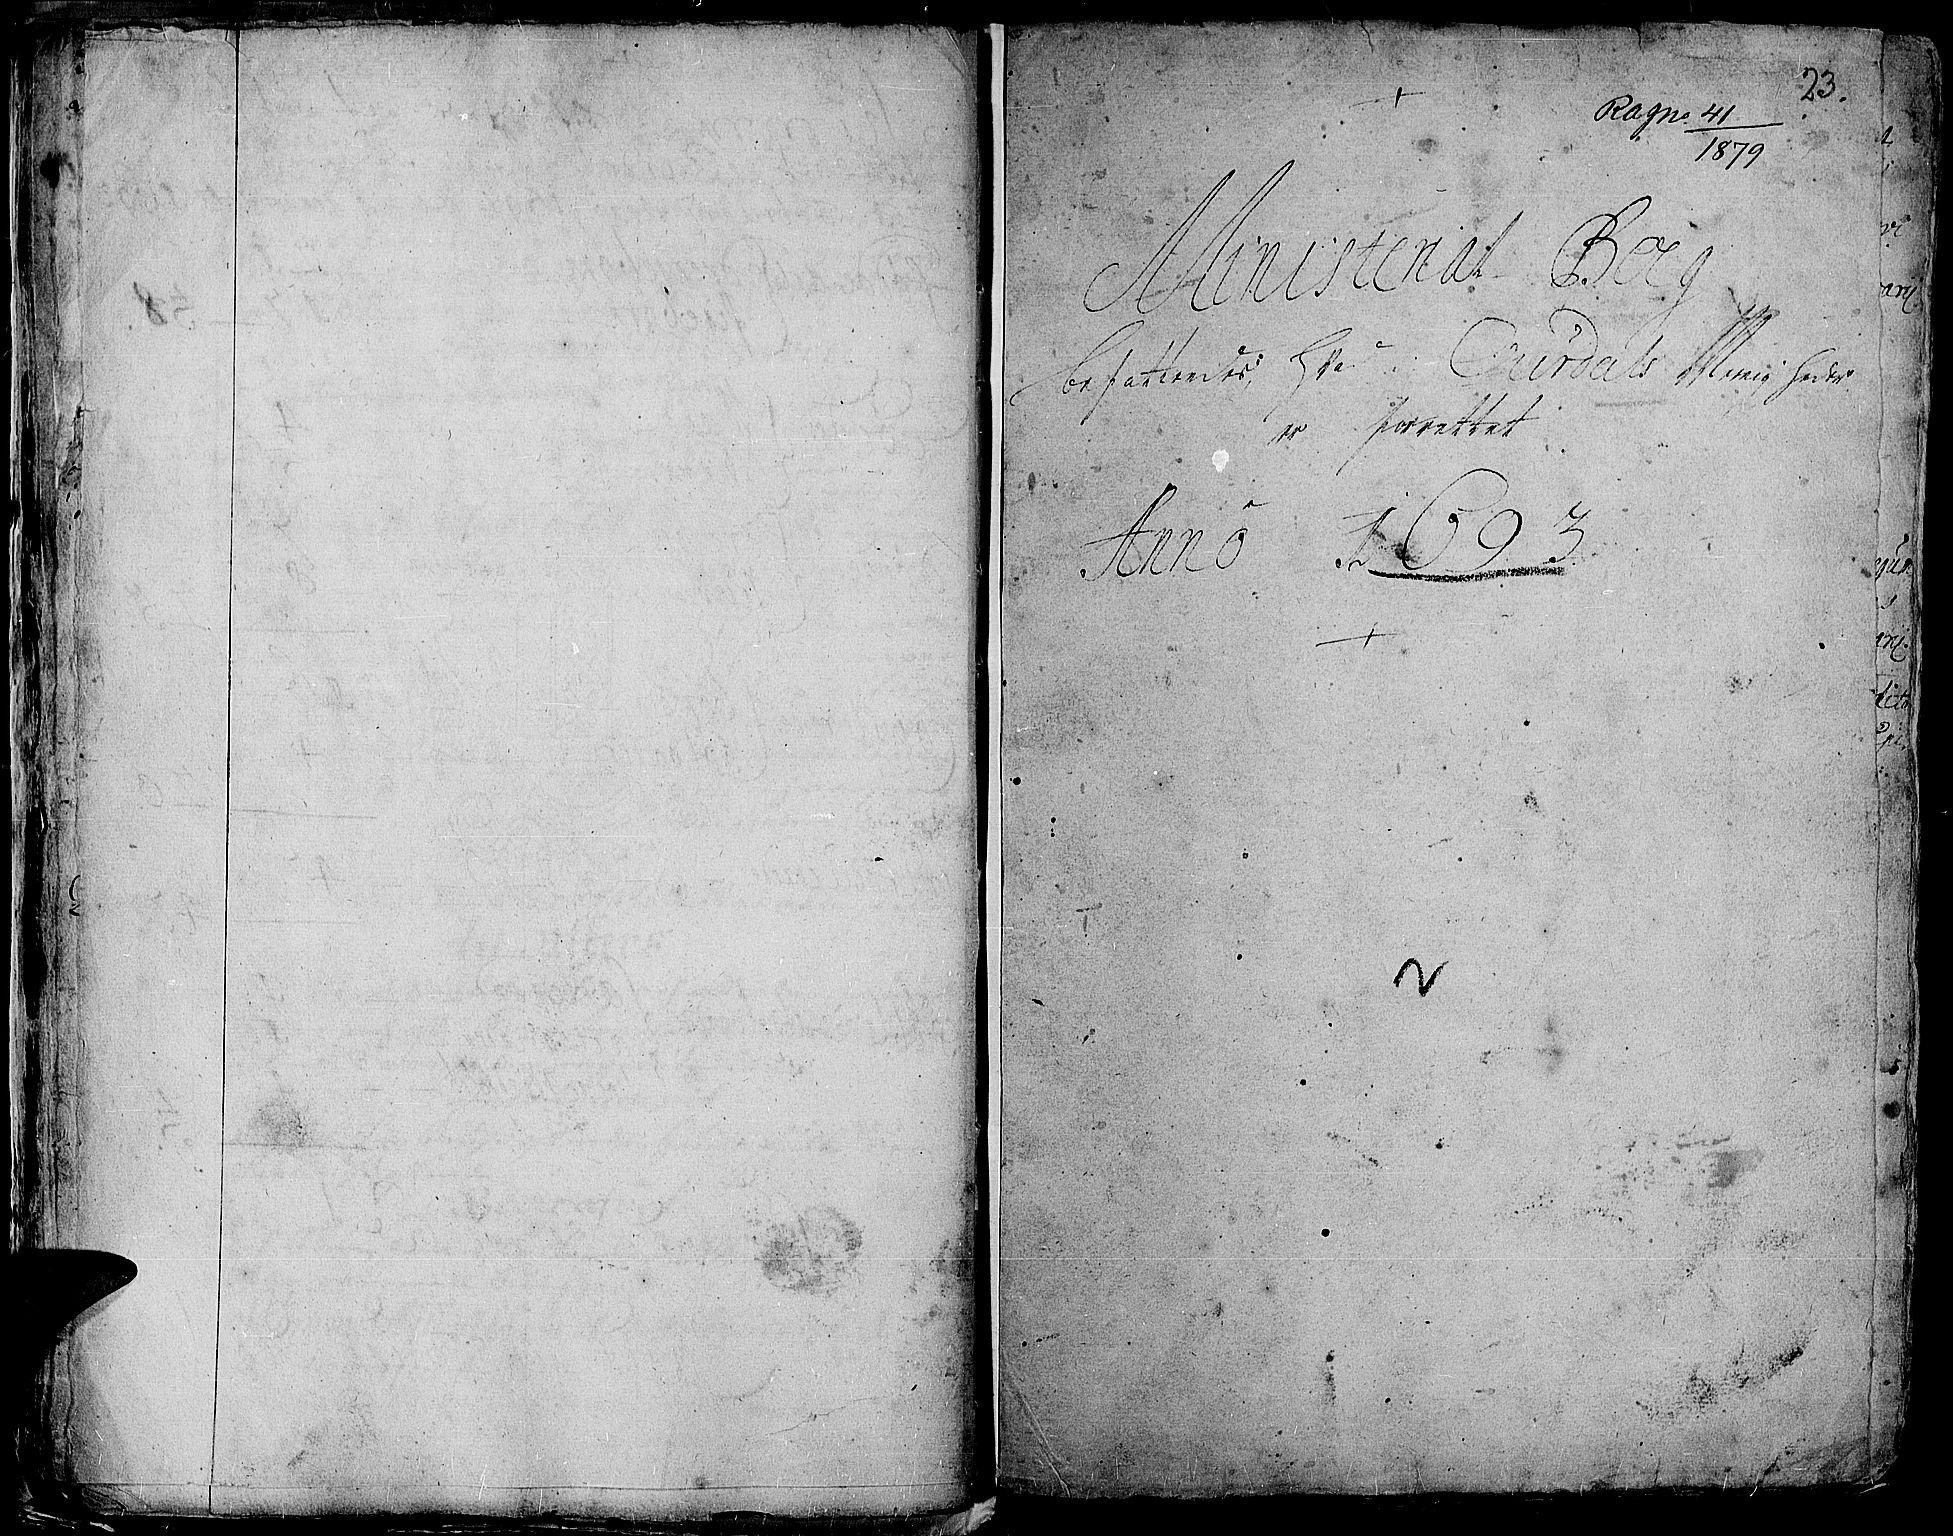 SAH, Aurdal prestekontor, Ministerialbok nr. 1-3, 1692-1730, s. 23